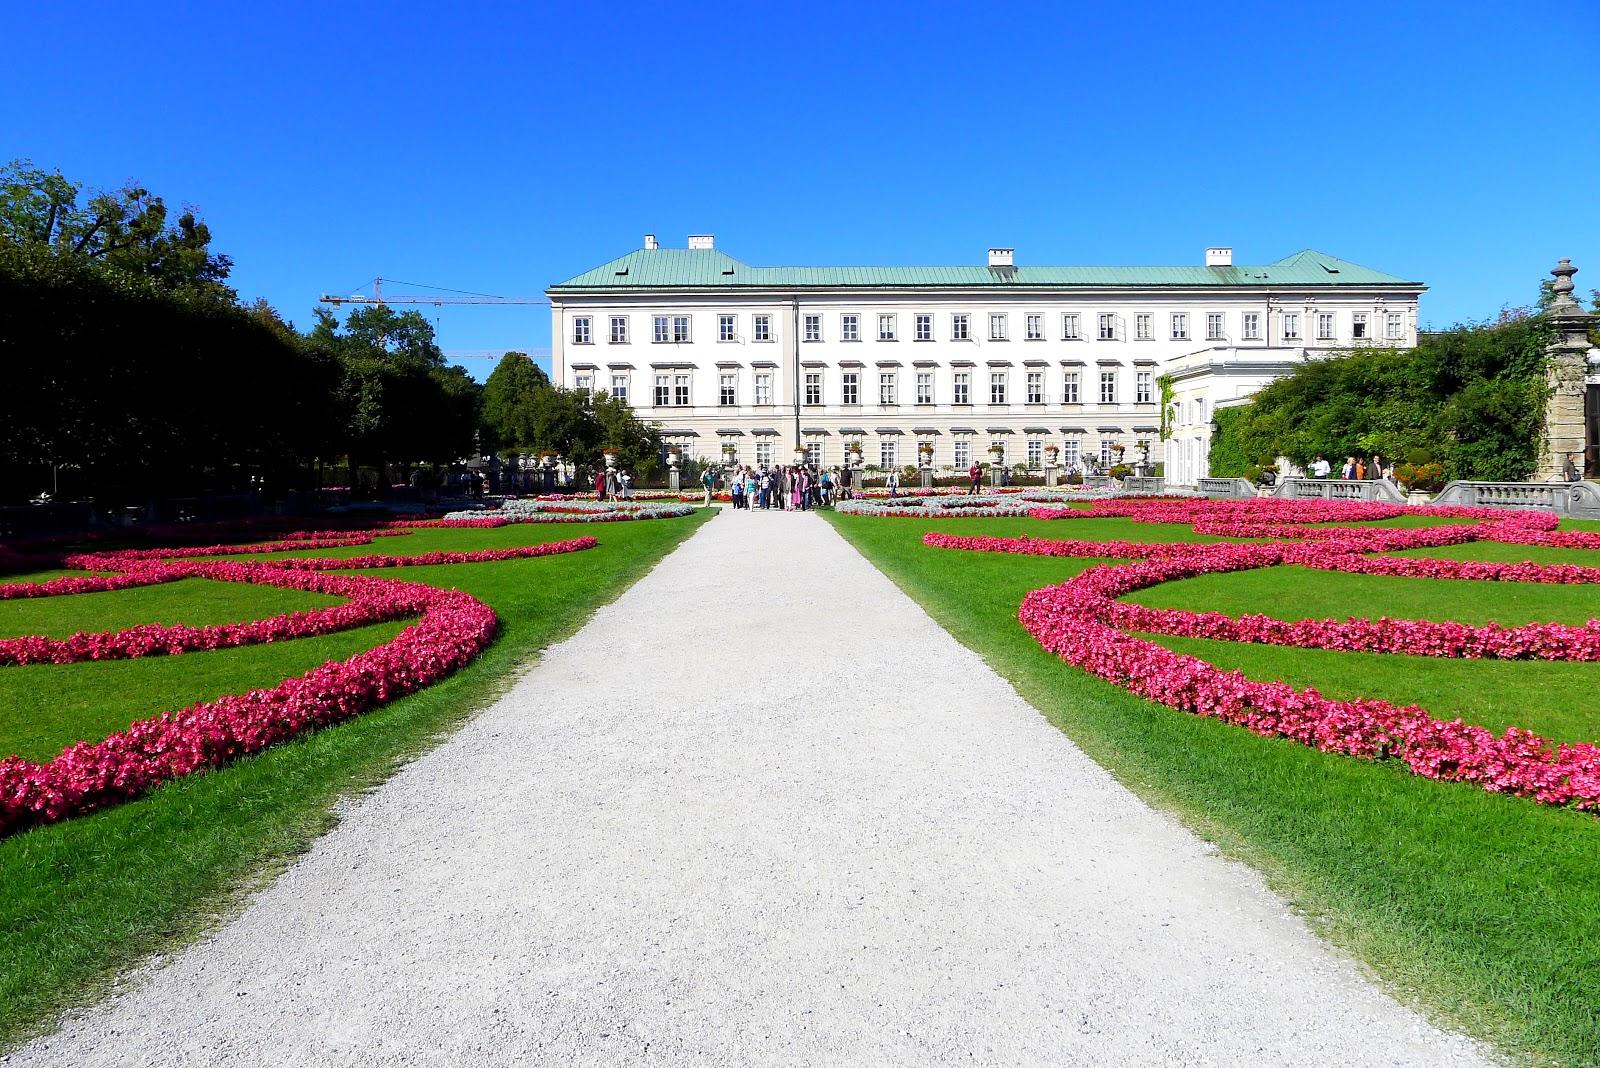 Aepert Images: 奧地利薩爾茲堡(米拉貝爾宮殿花園) │ Sep.2018